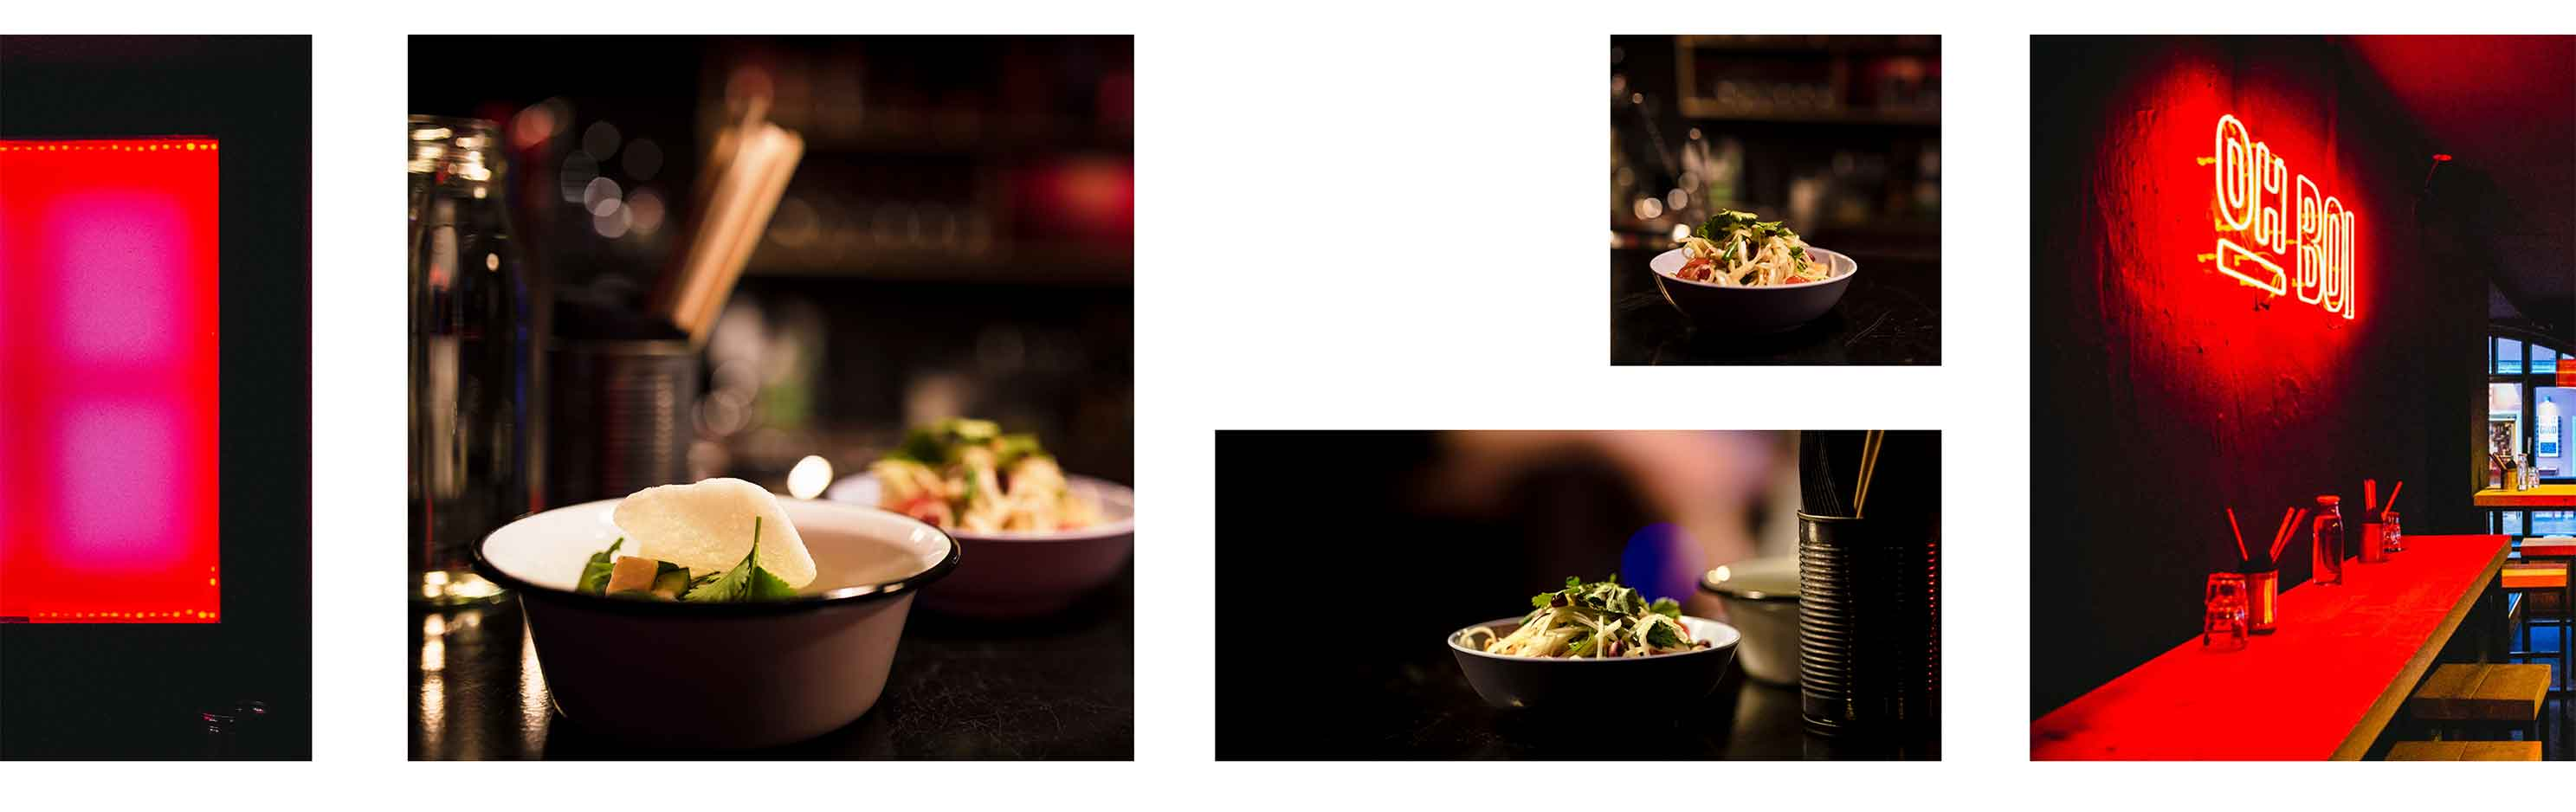 08-oh-boi-bar-food-augsburg-branding-design-leuchtreklame-interieur